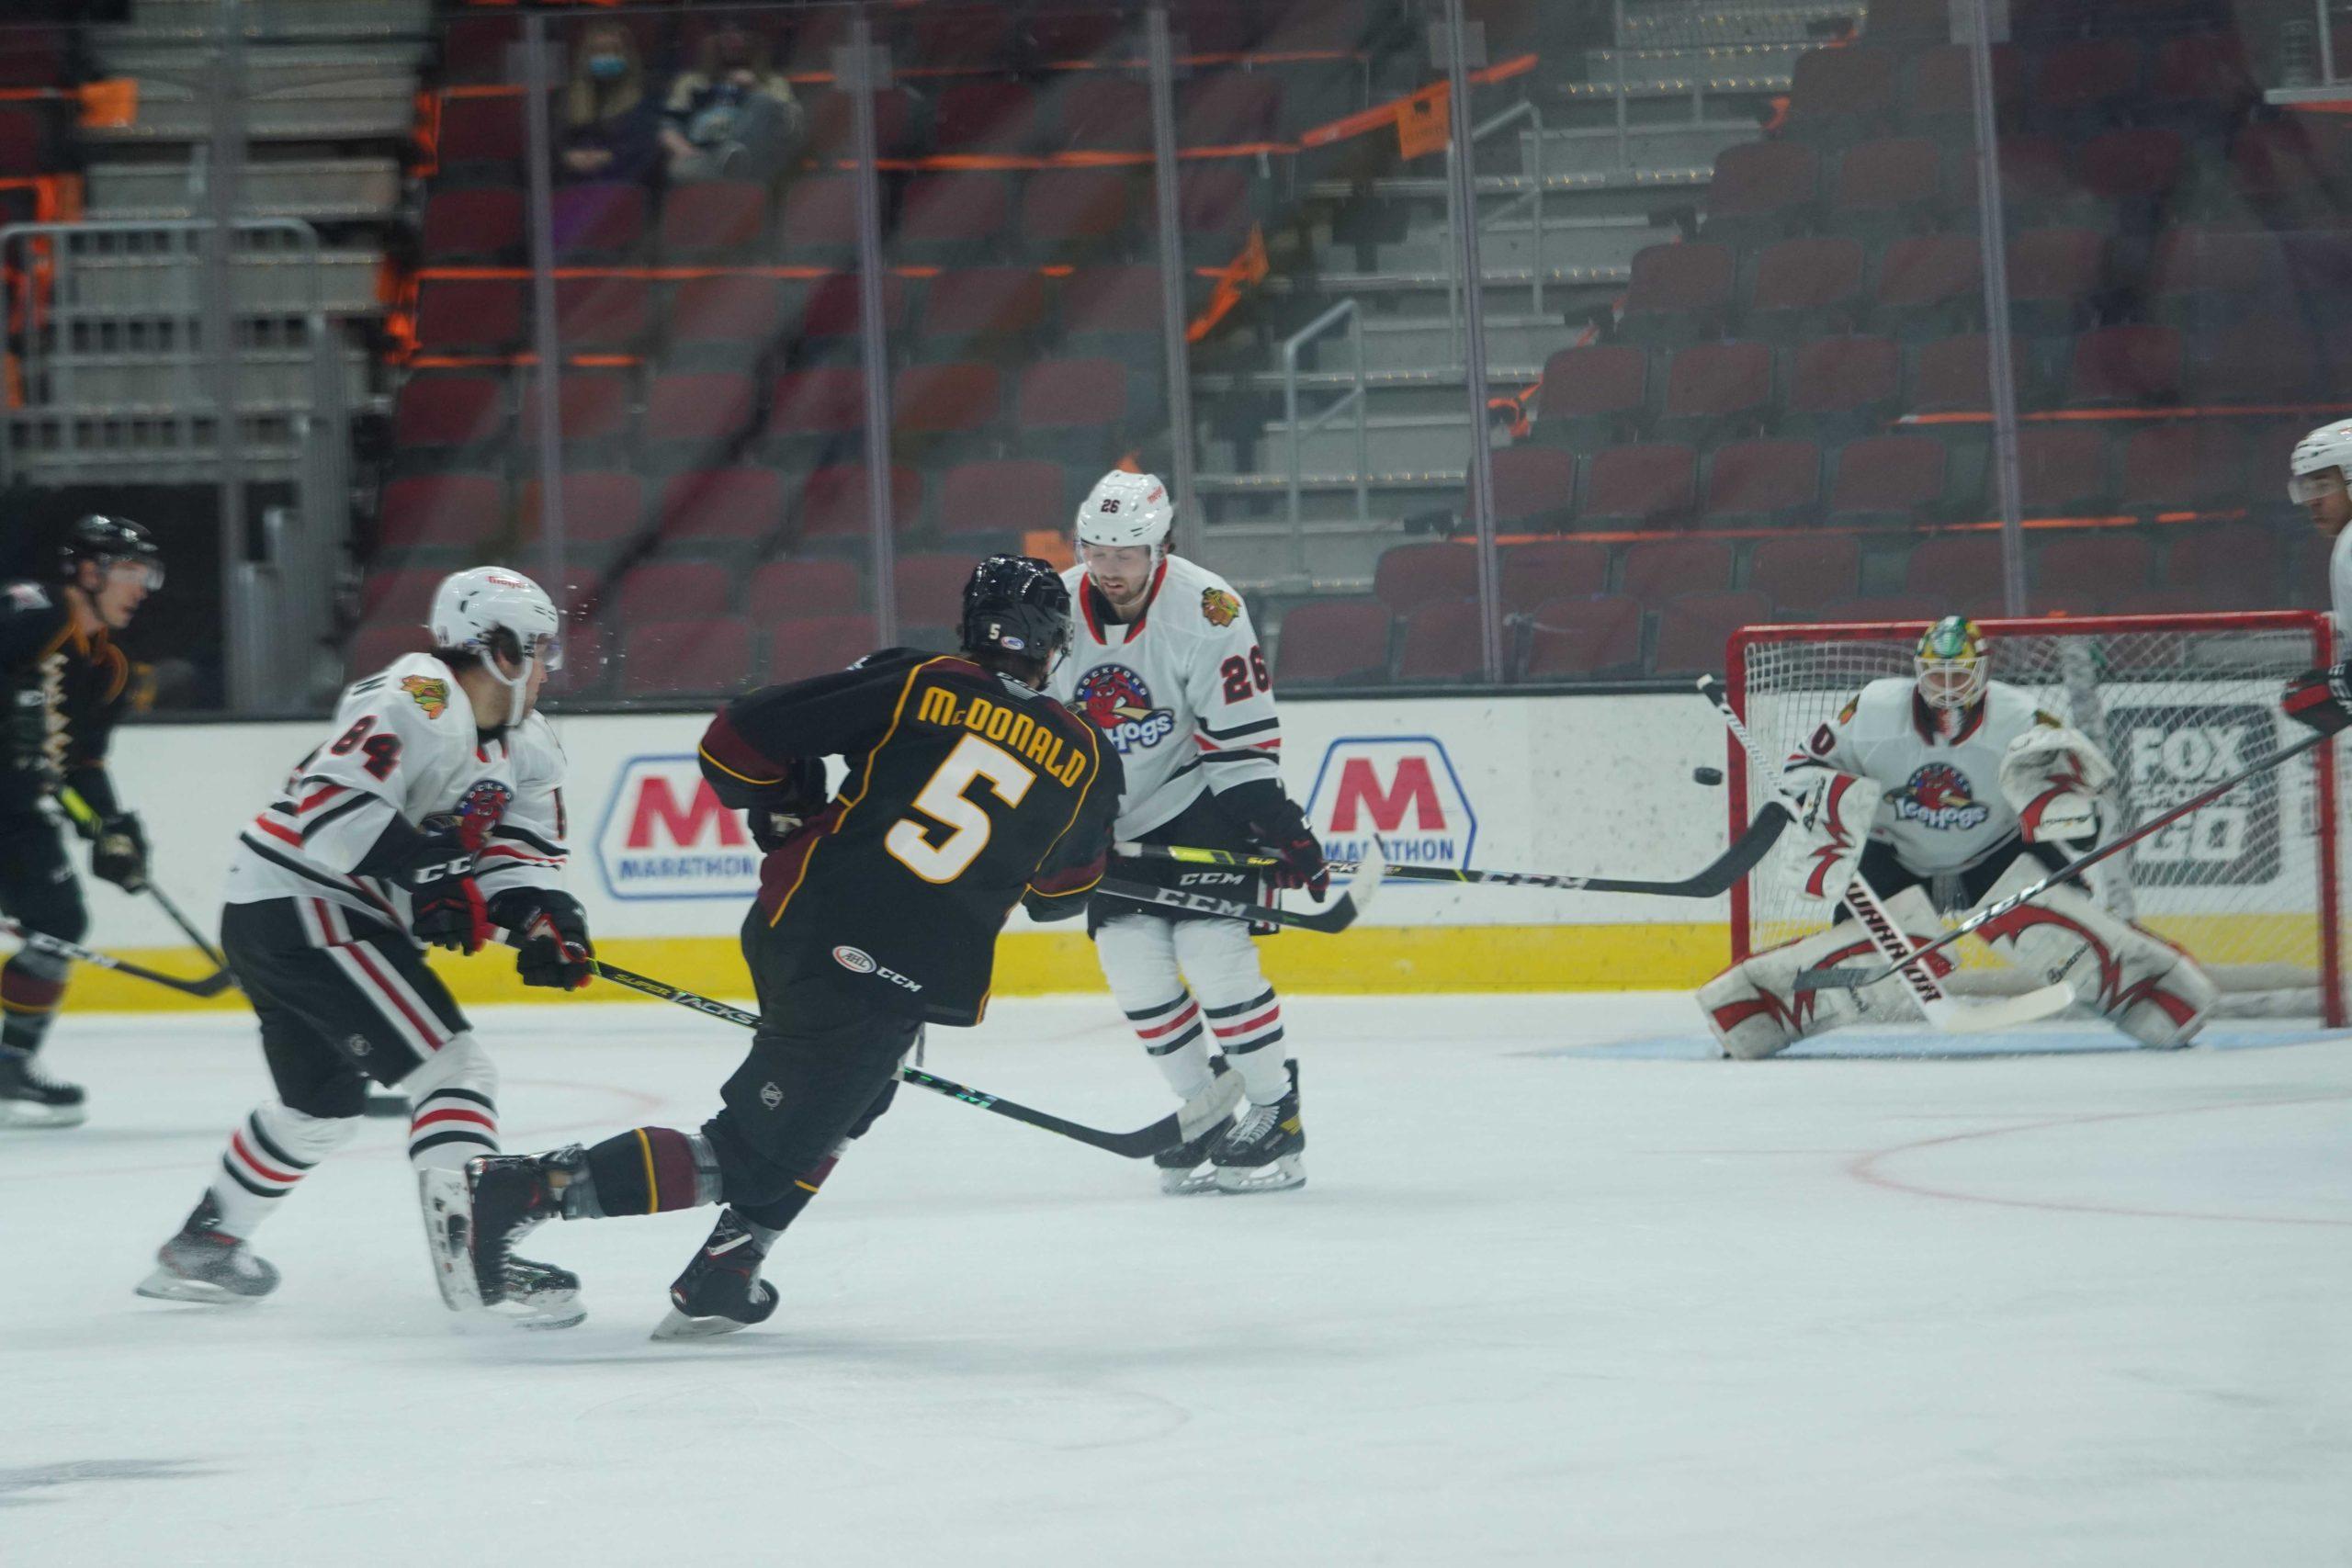 Cleveland Monsters defenseman shoots on Rockford IceHogs goaltender Collin Delia.